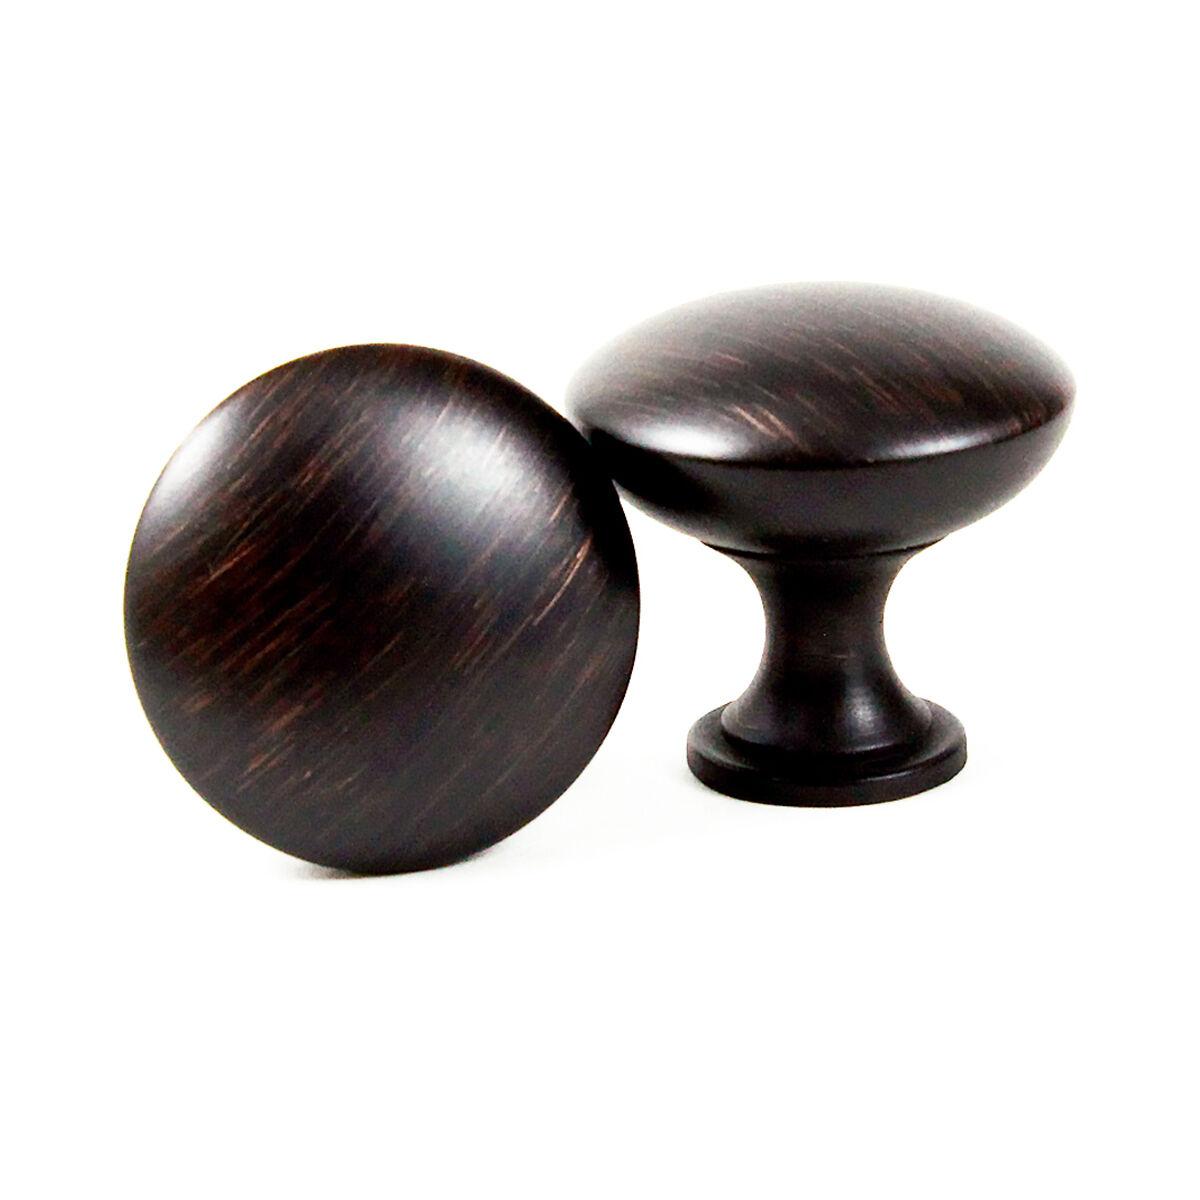 Brush Oil Rubbed Bronze Mushroom Kitchen Cabinet Hardware Knob Pull